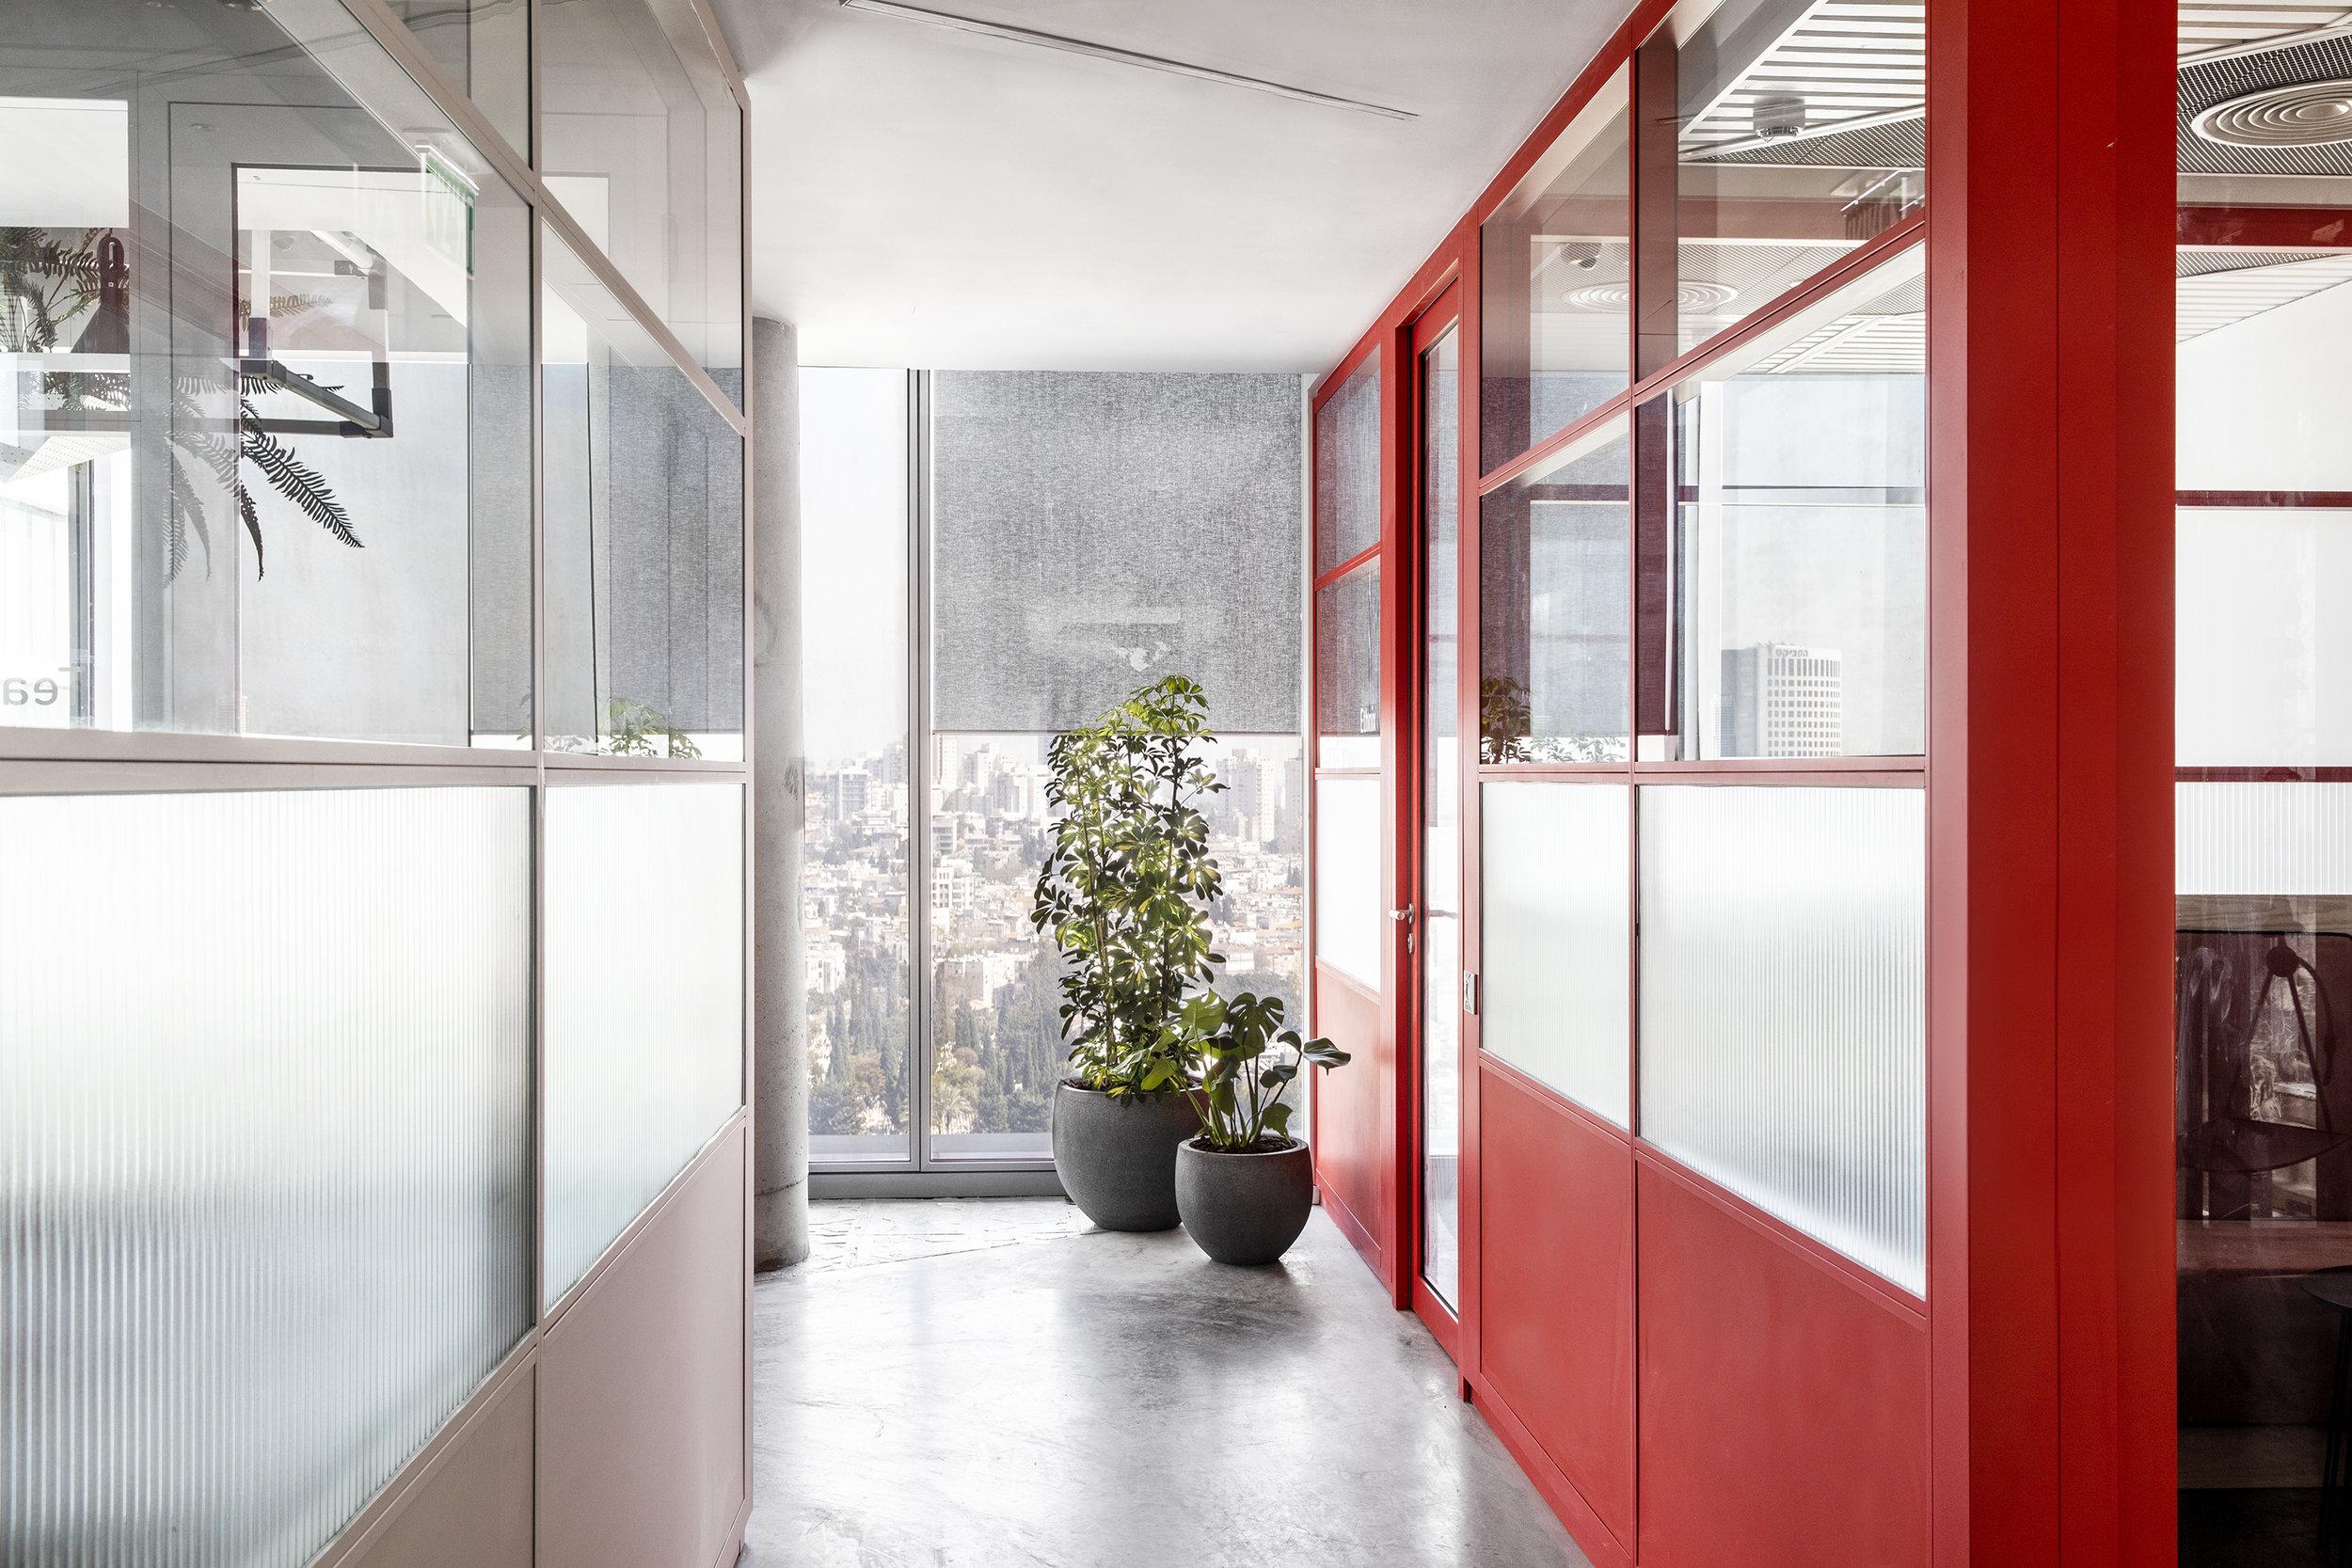 רואי דוד אדריכלות - אדריכל - נטורל אינטליג'נס - ROY DAVID - ARCHITECTURE - ARCHITECT - NI (67).jpg